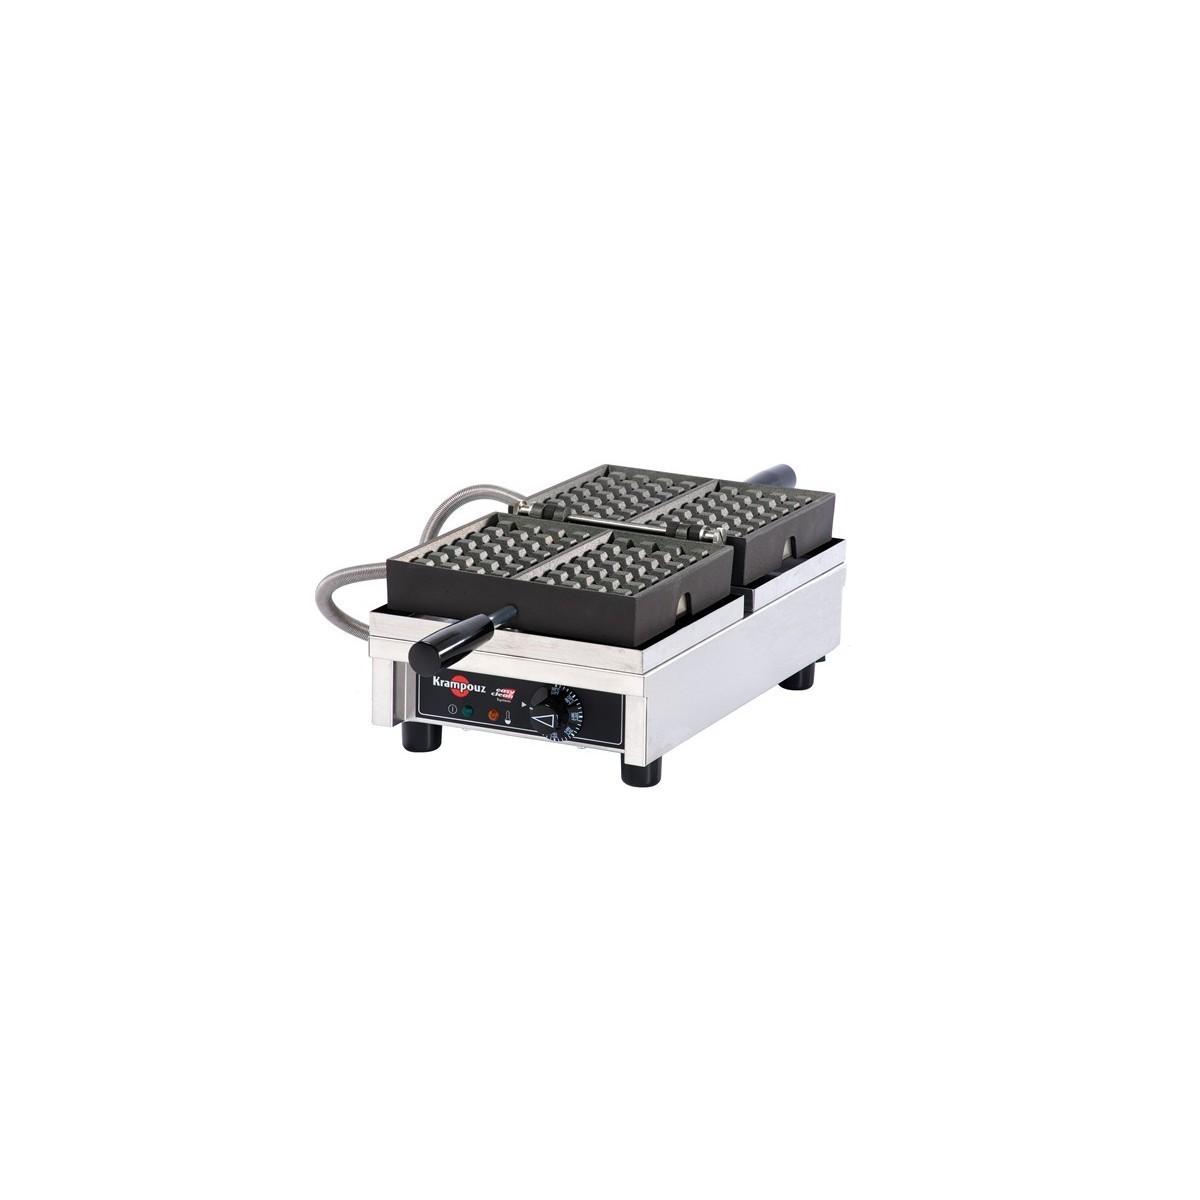 Krampouz - Electric Waffle Makers, Liege, 4x6, 180 deg